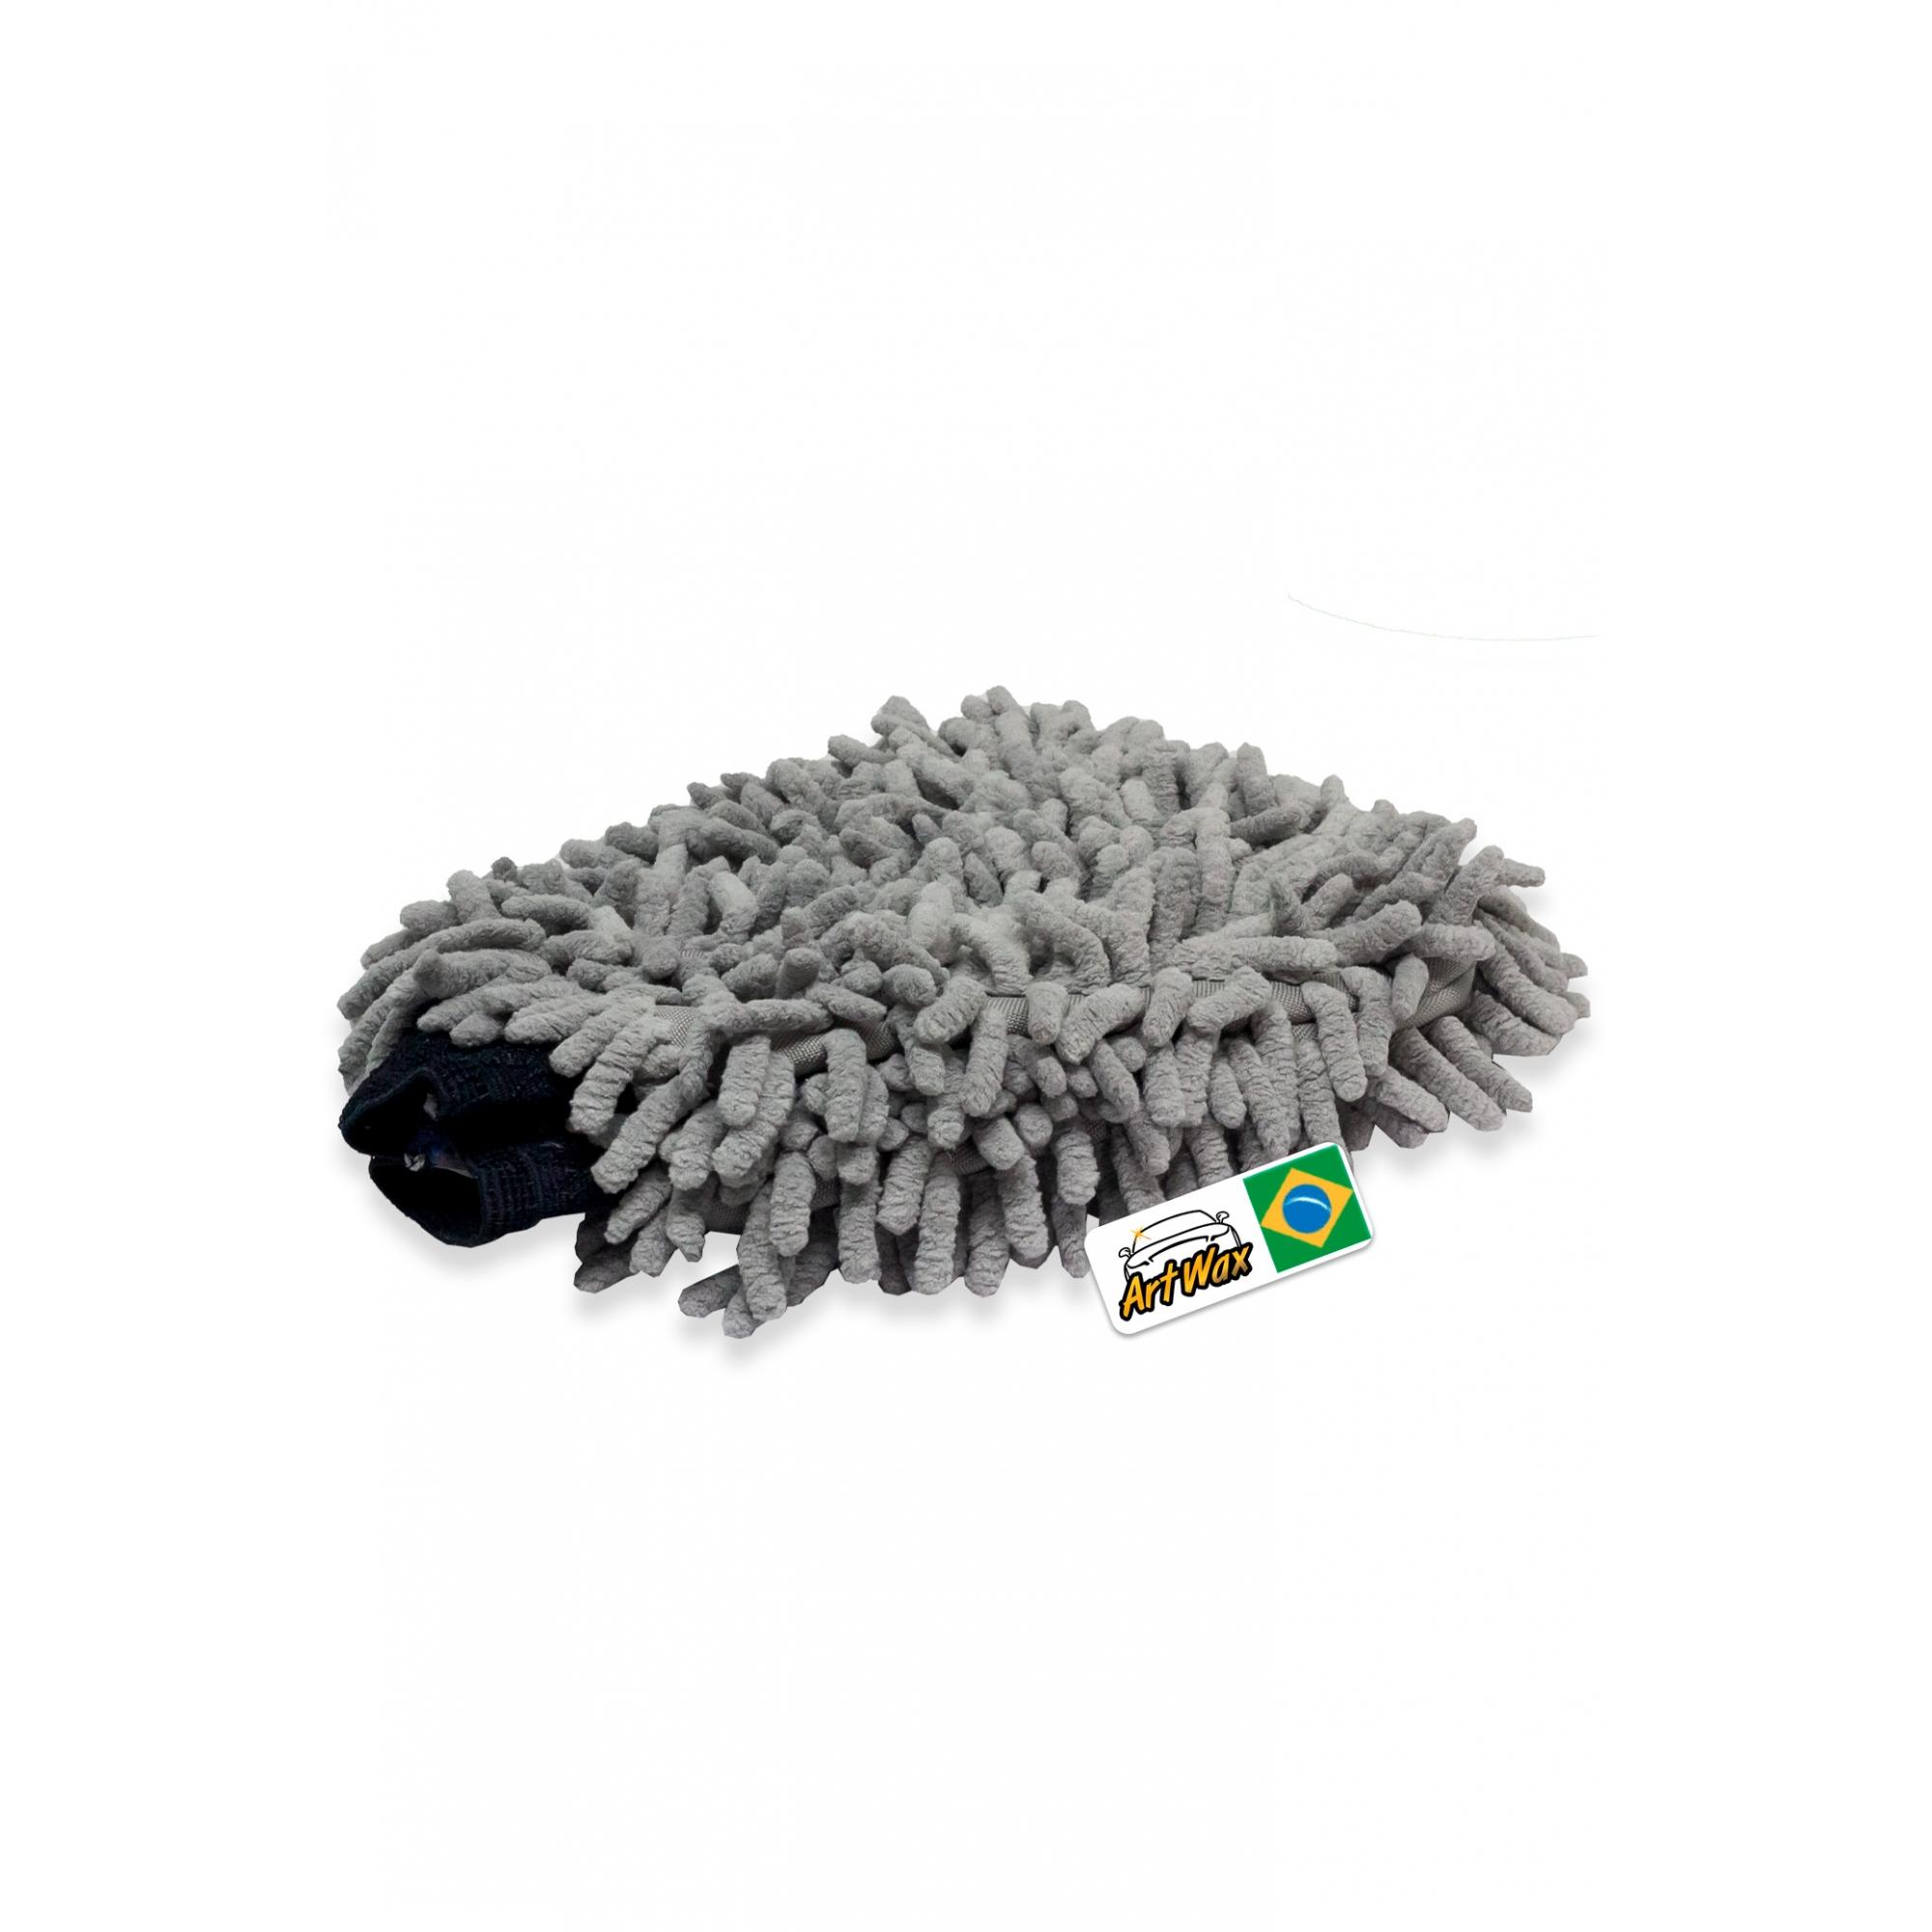 Vonixx Luva de Microfibra Tentaculos 25x16cm 105gsm